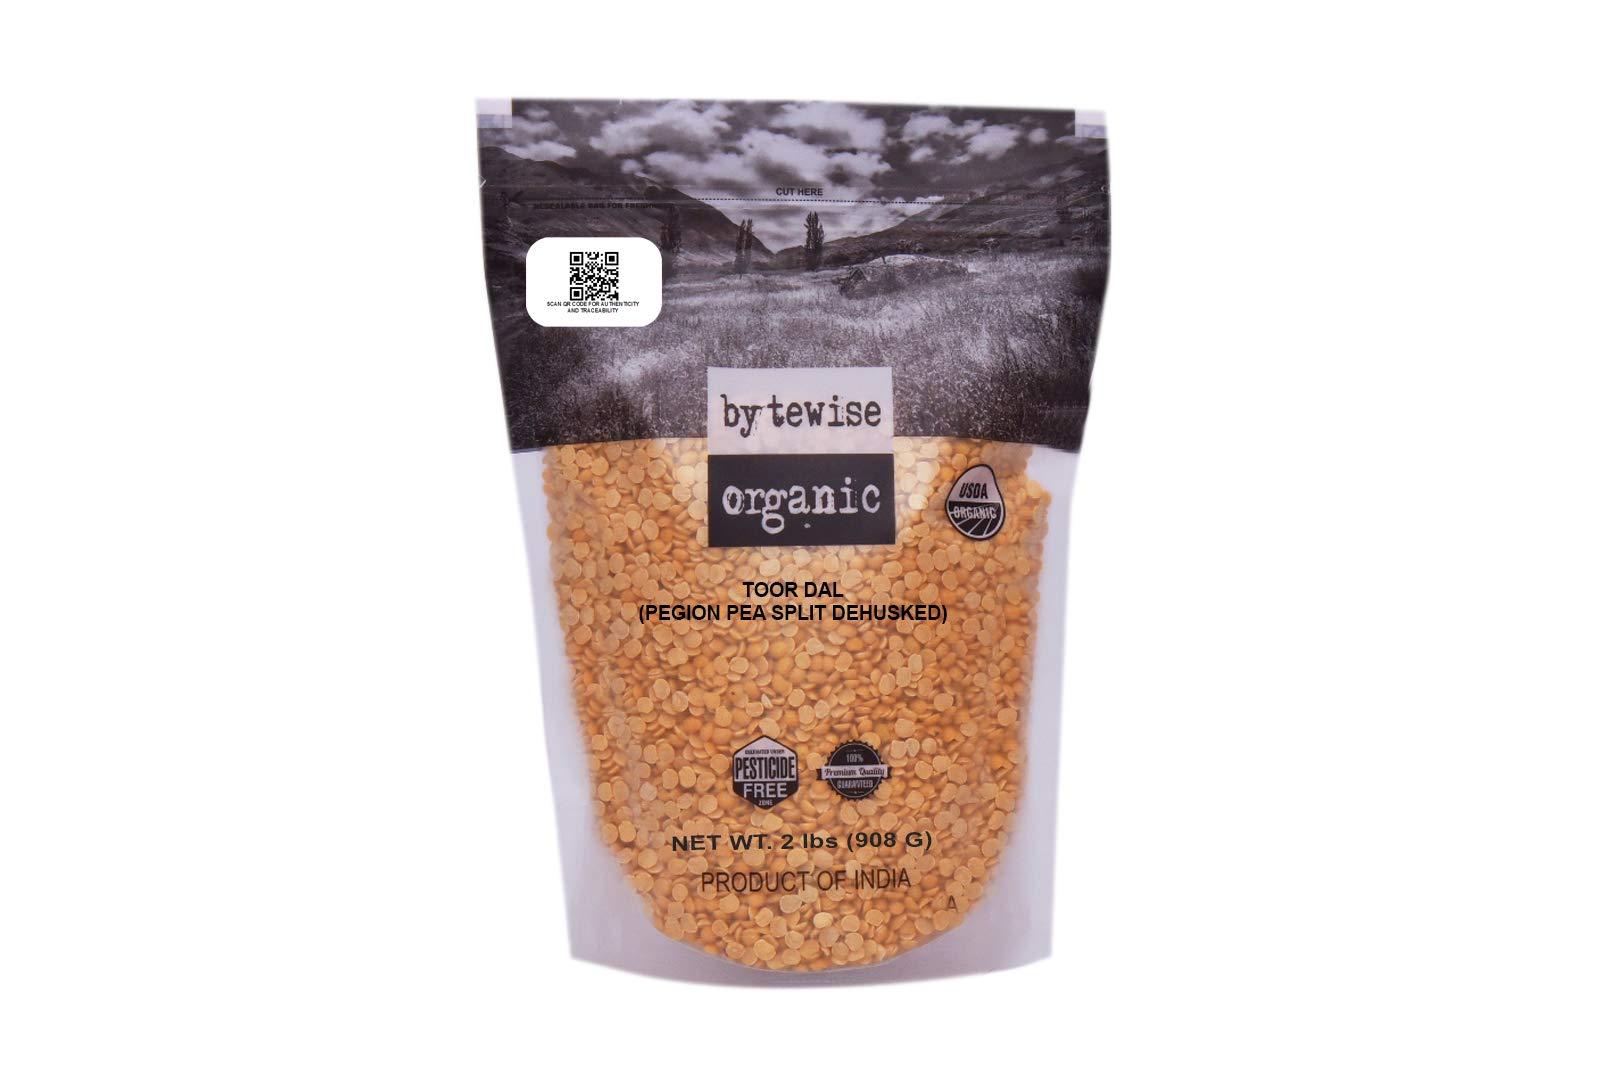 Bytewise Organic Pigeon Pea Split Lentil/Toor Dal, 2lb